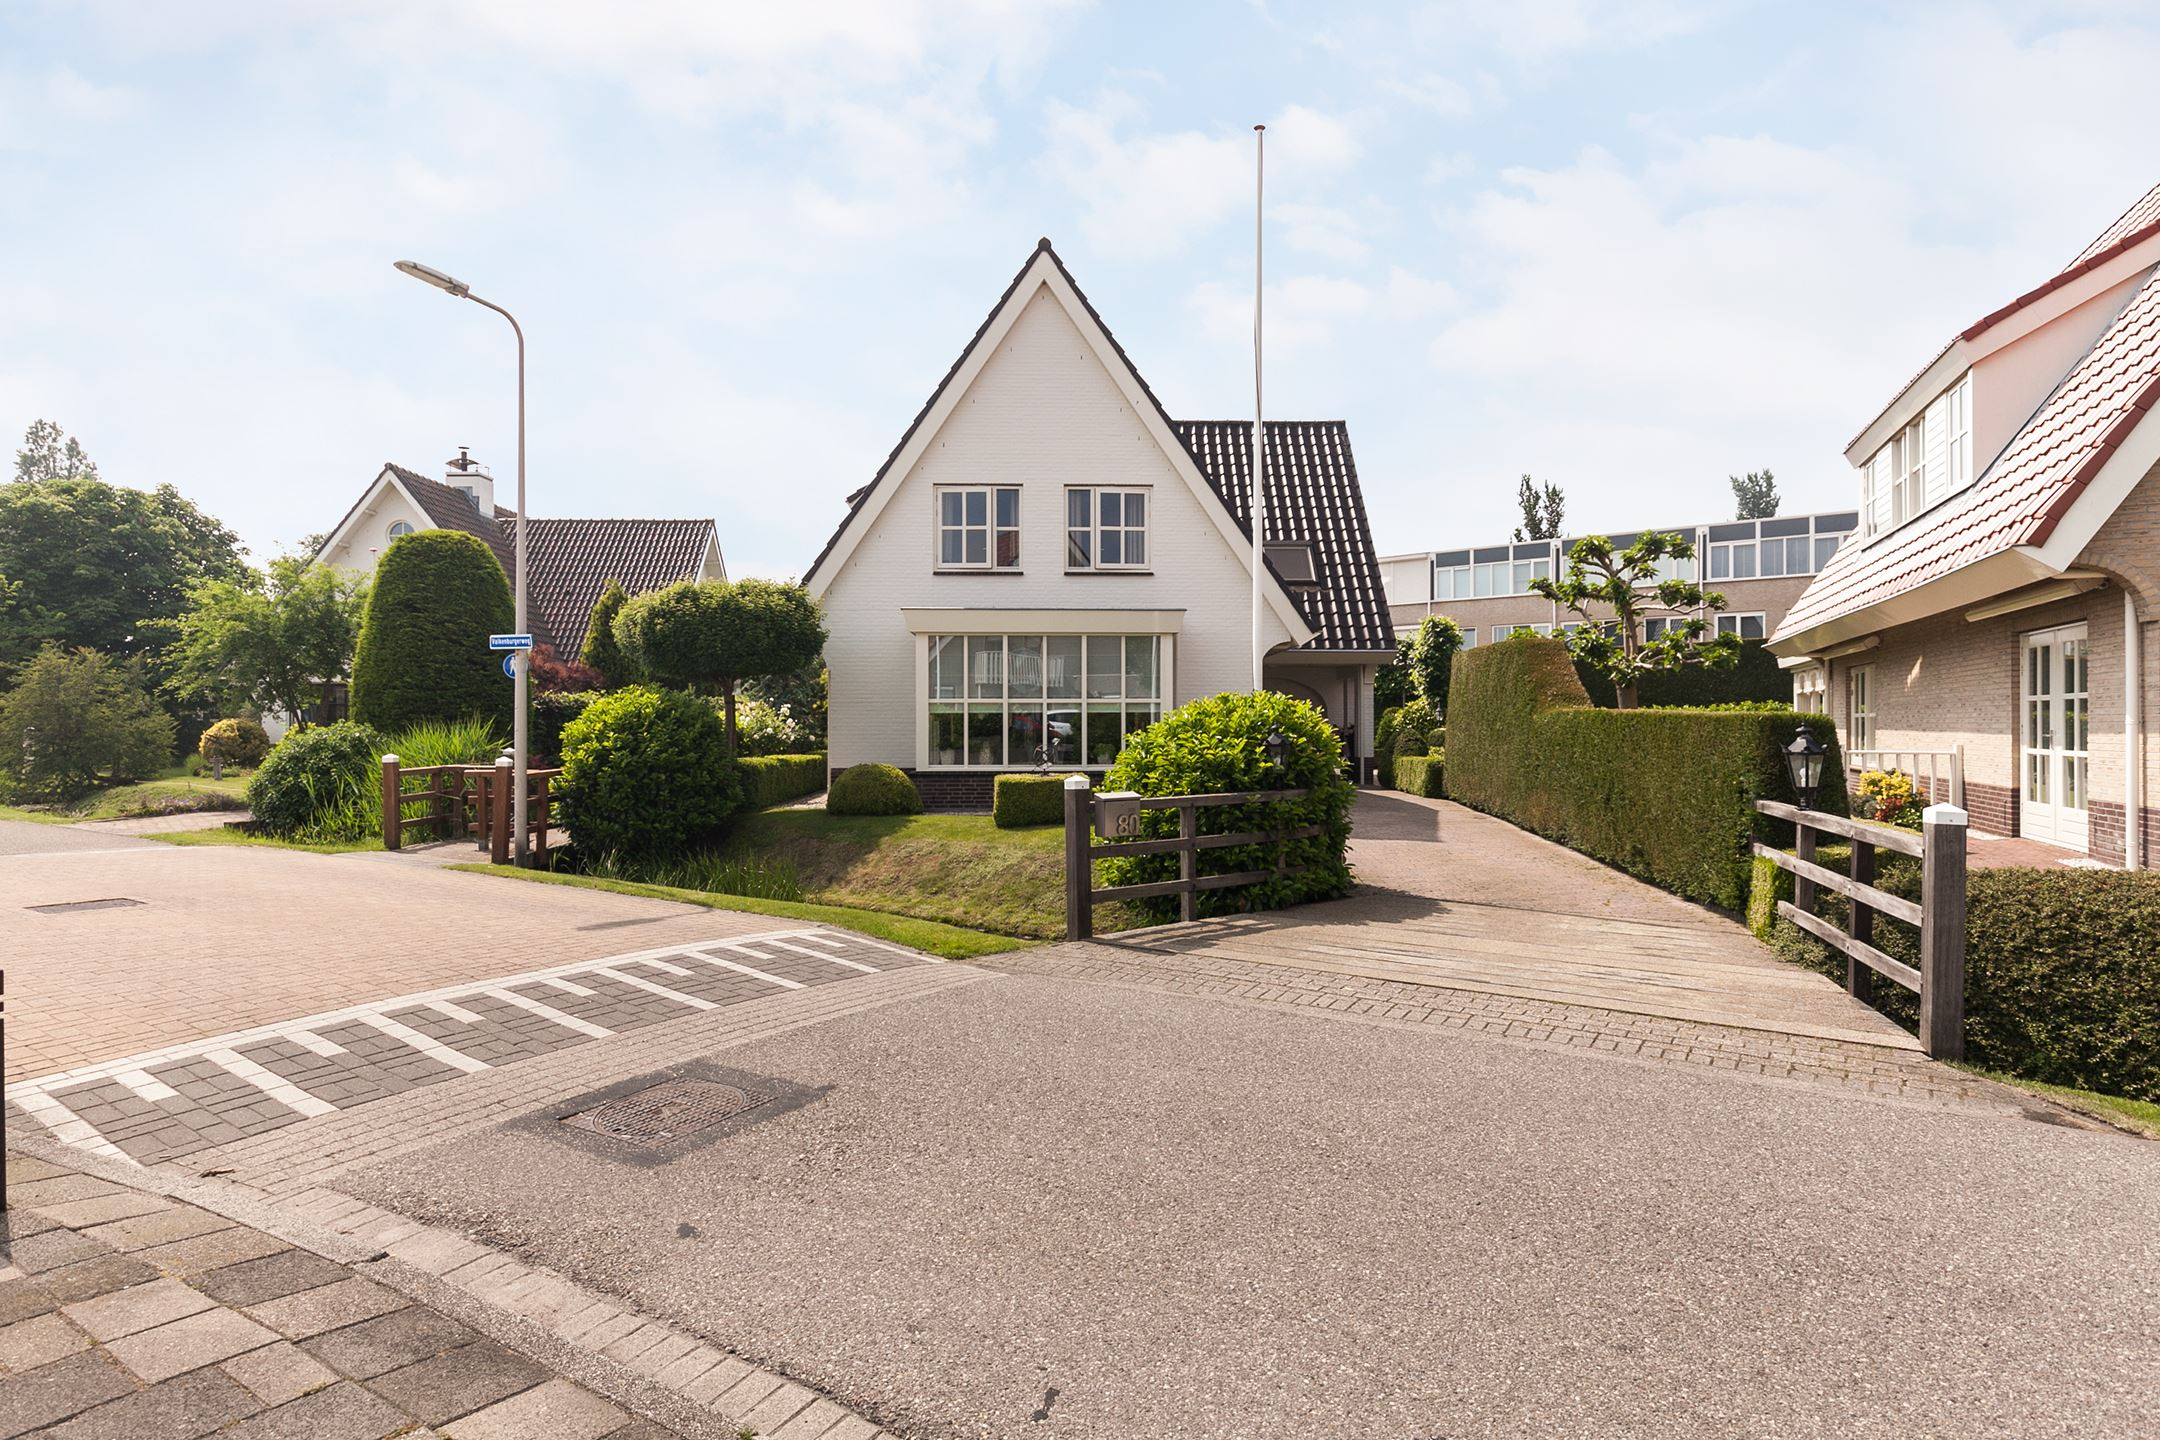 Kuivenhoven Keukens Rijnsburg : Huis te koop valkenburgerweg ap rijnsburg funda